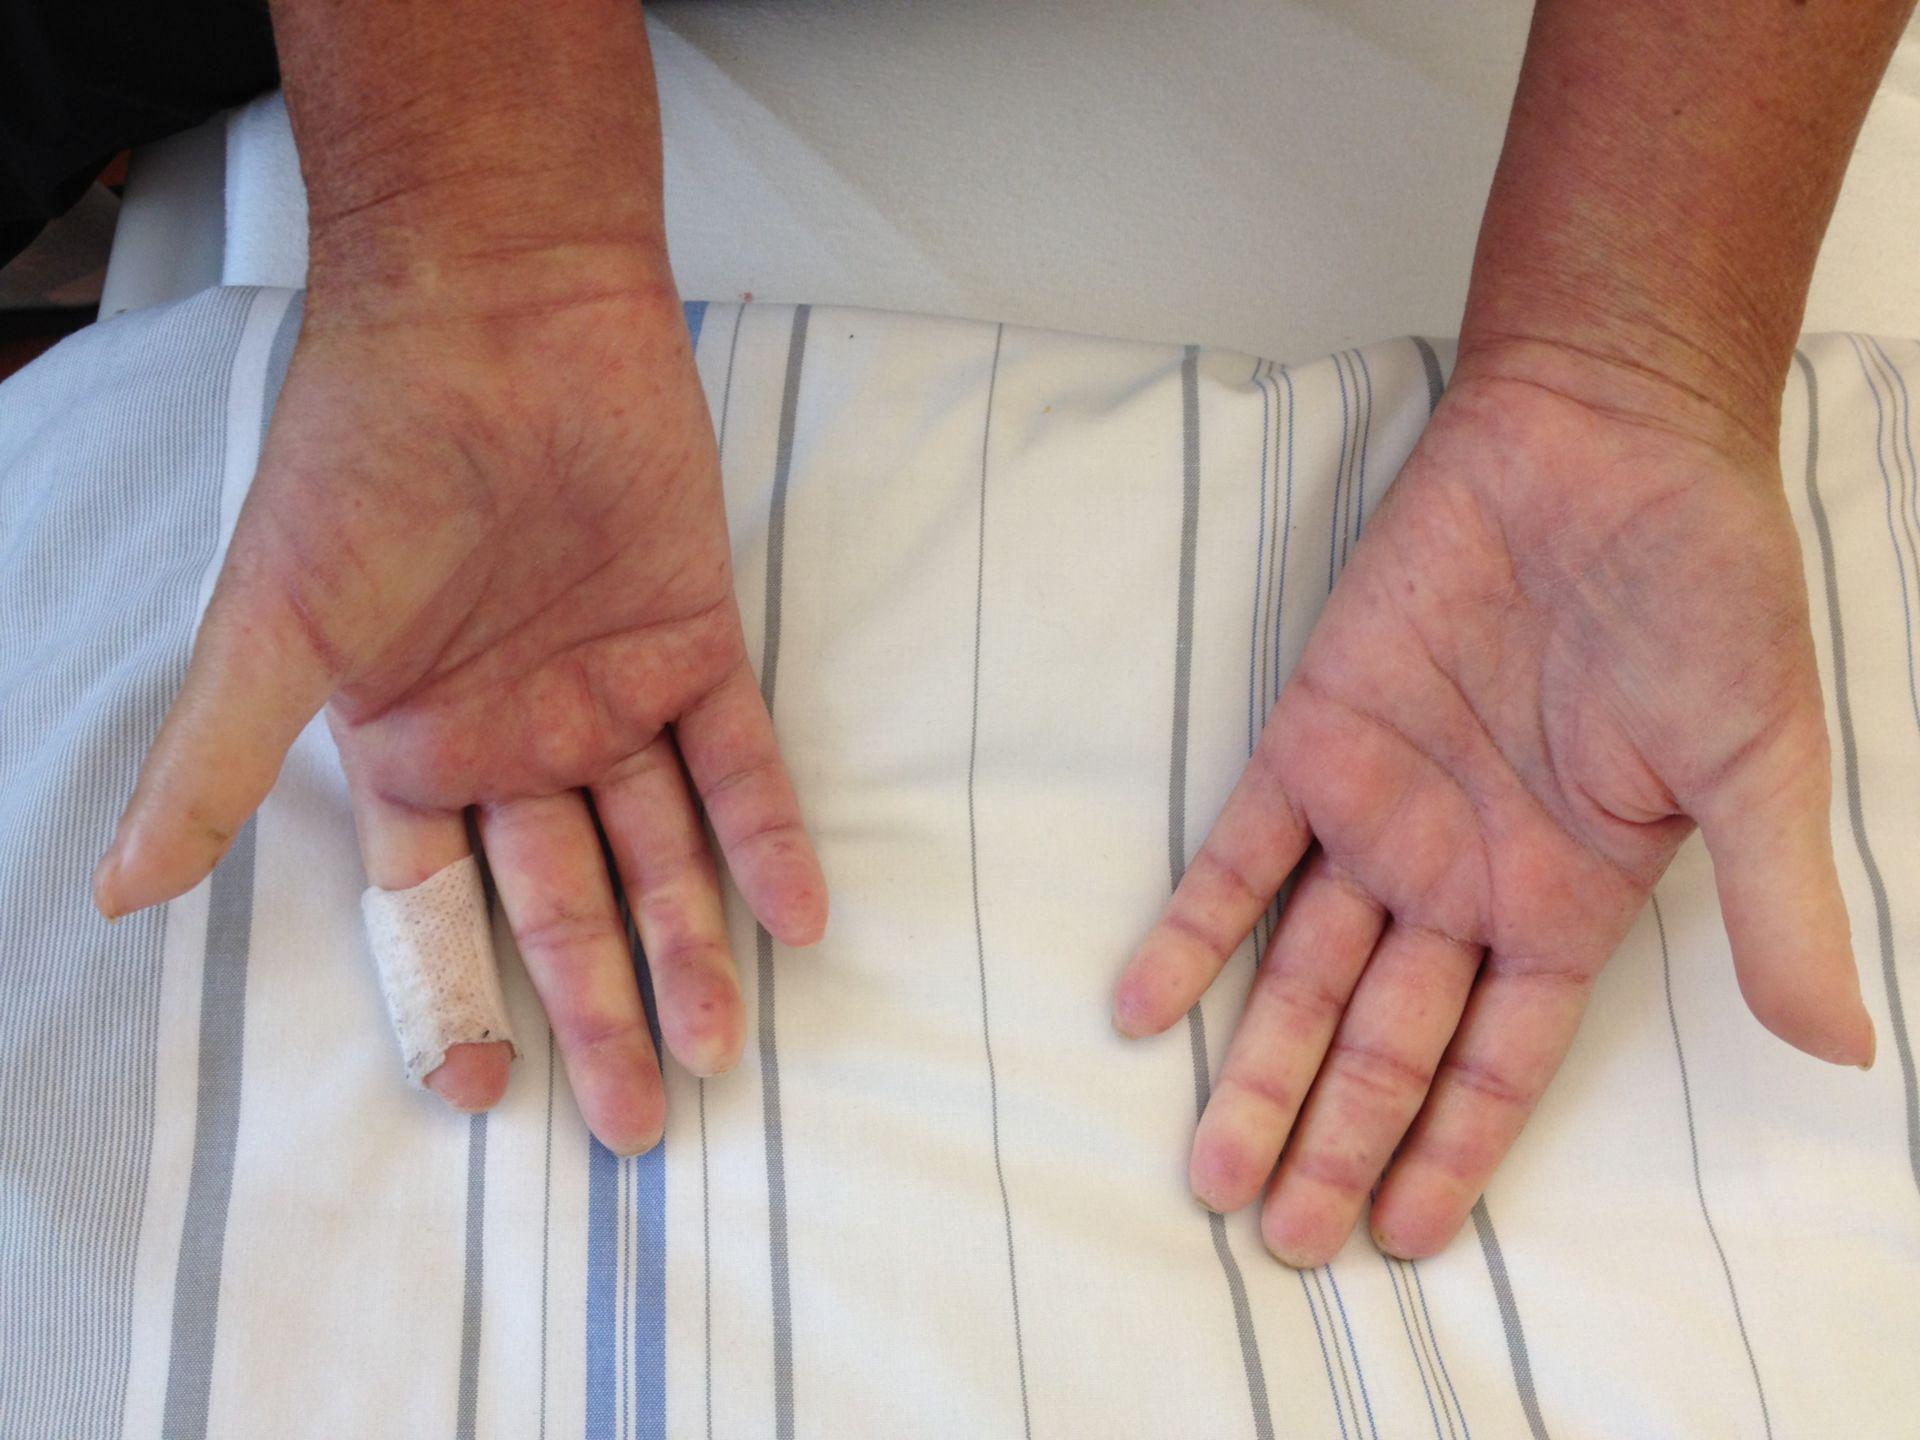 Sklerodaktylie und Raynaud-Symptomatik bei CREST-Syndrom (2/2)